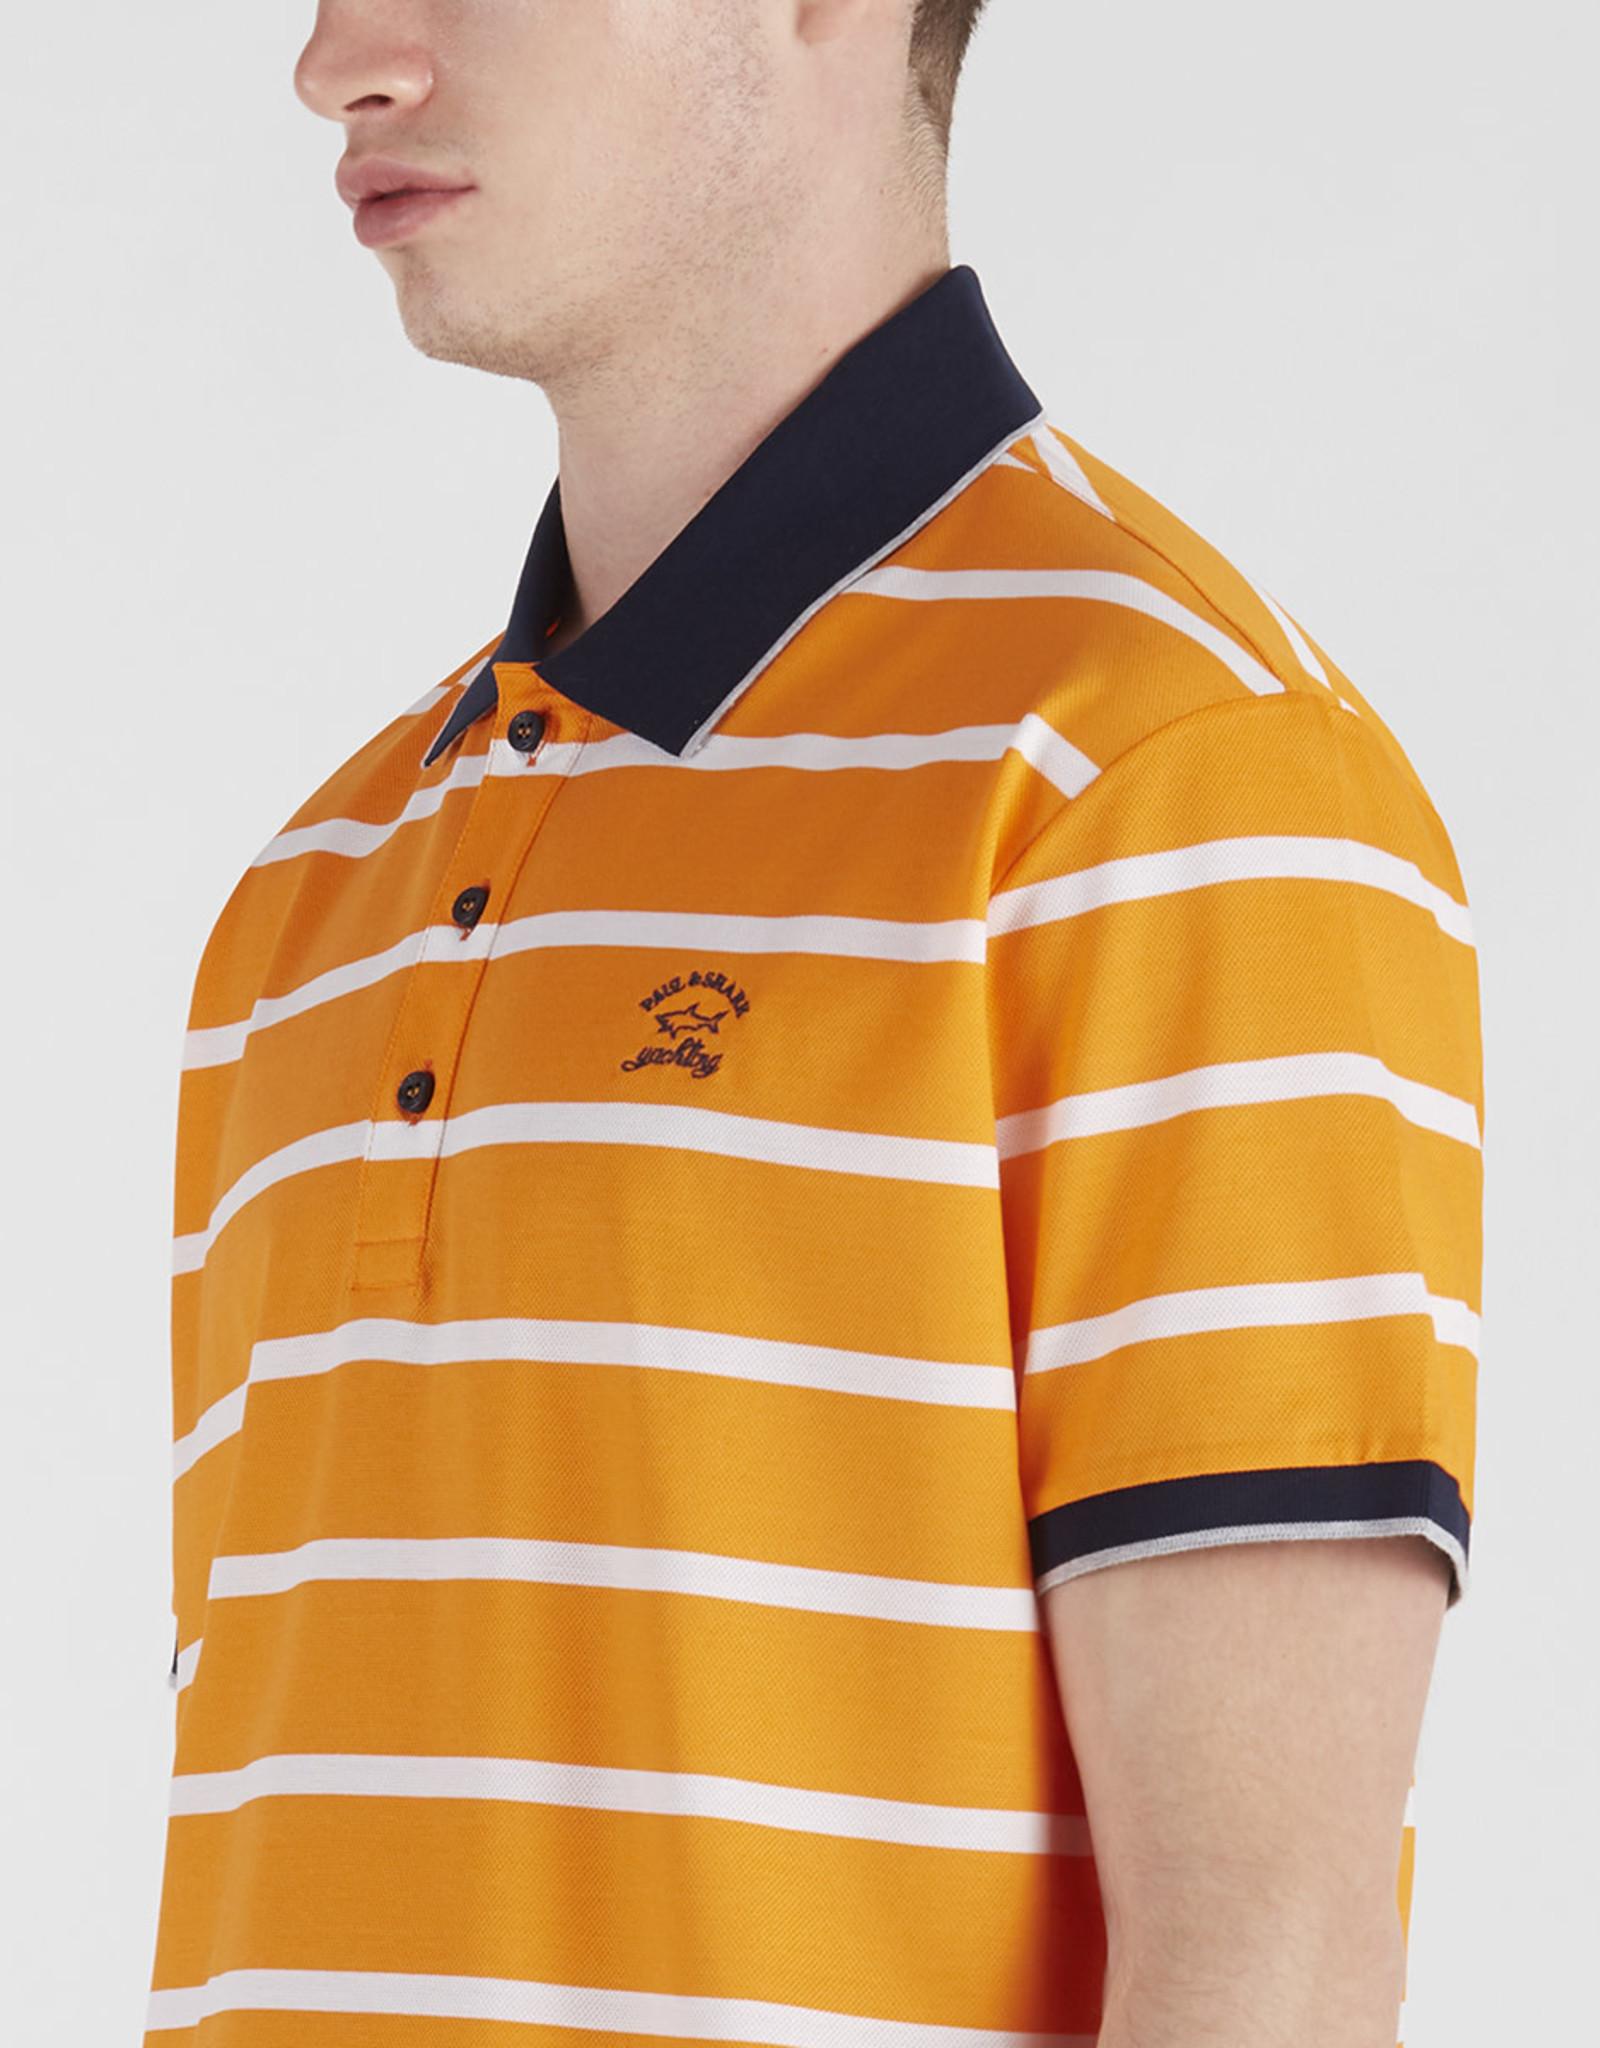 Paul & Shark polo korte mouw oranje met witte streep